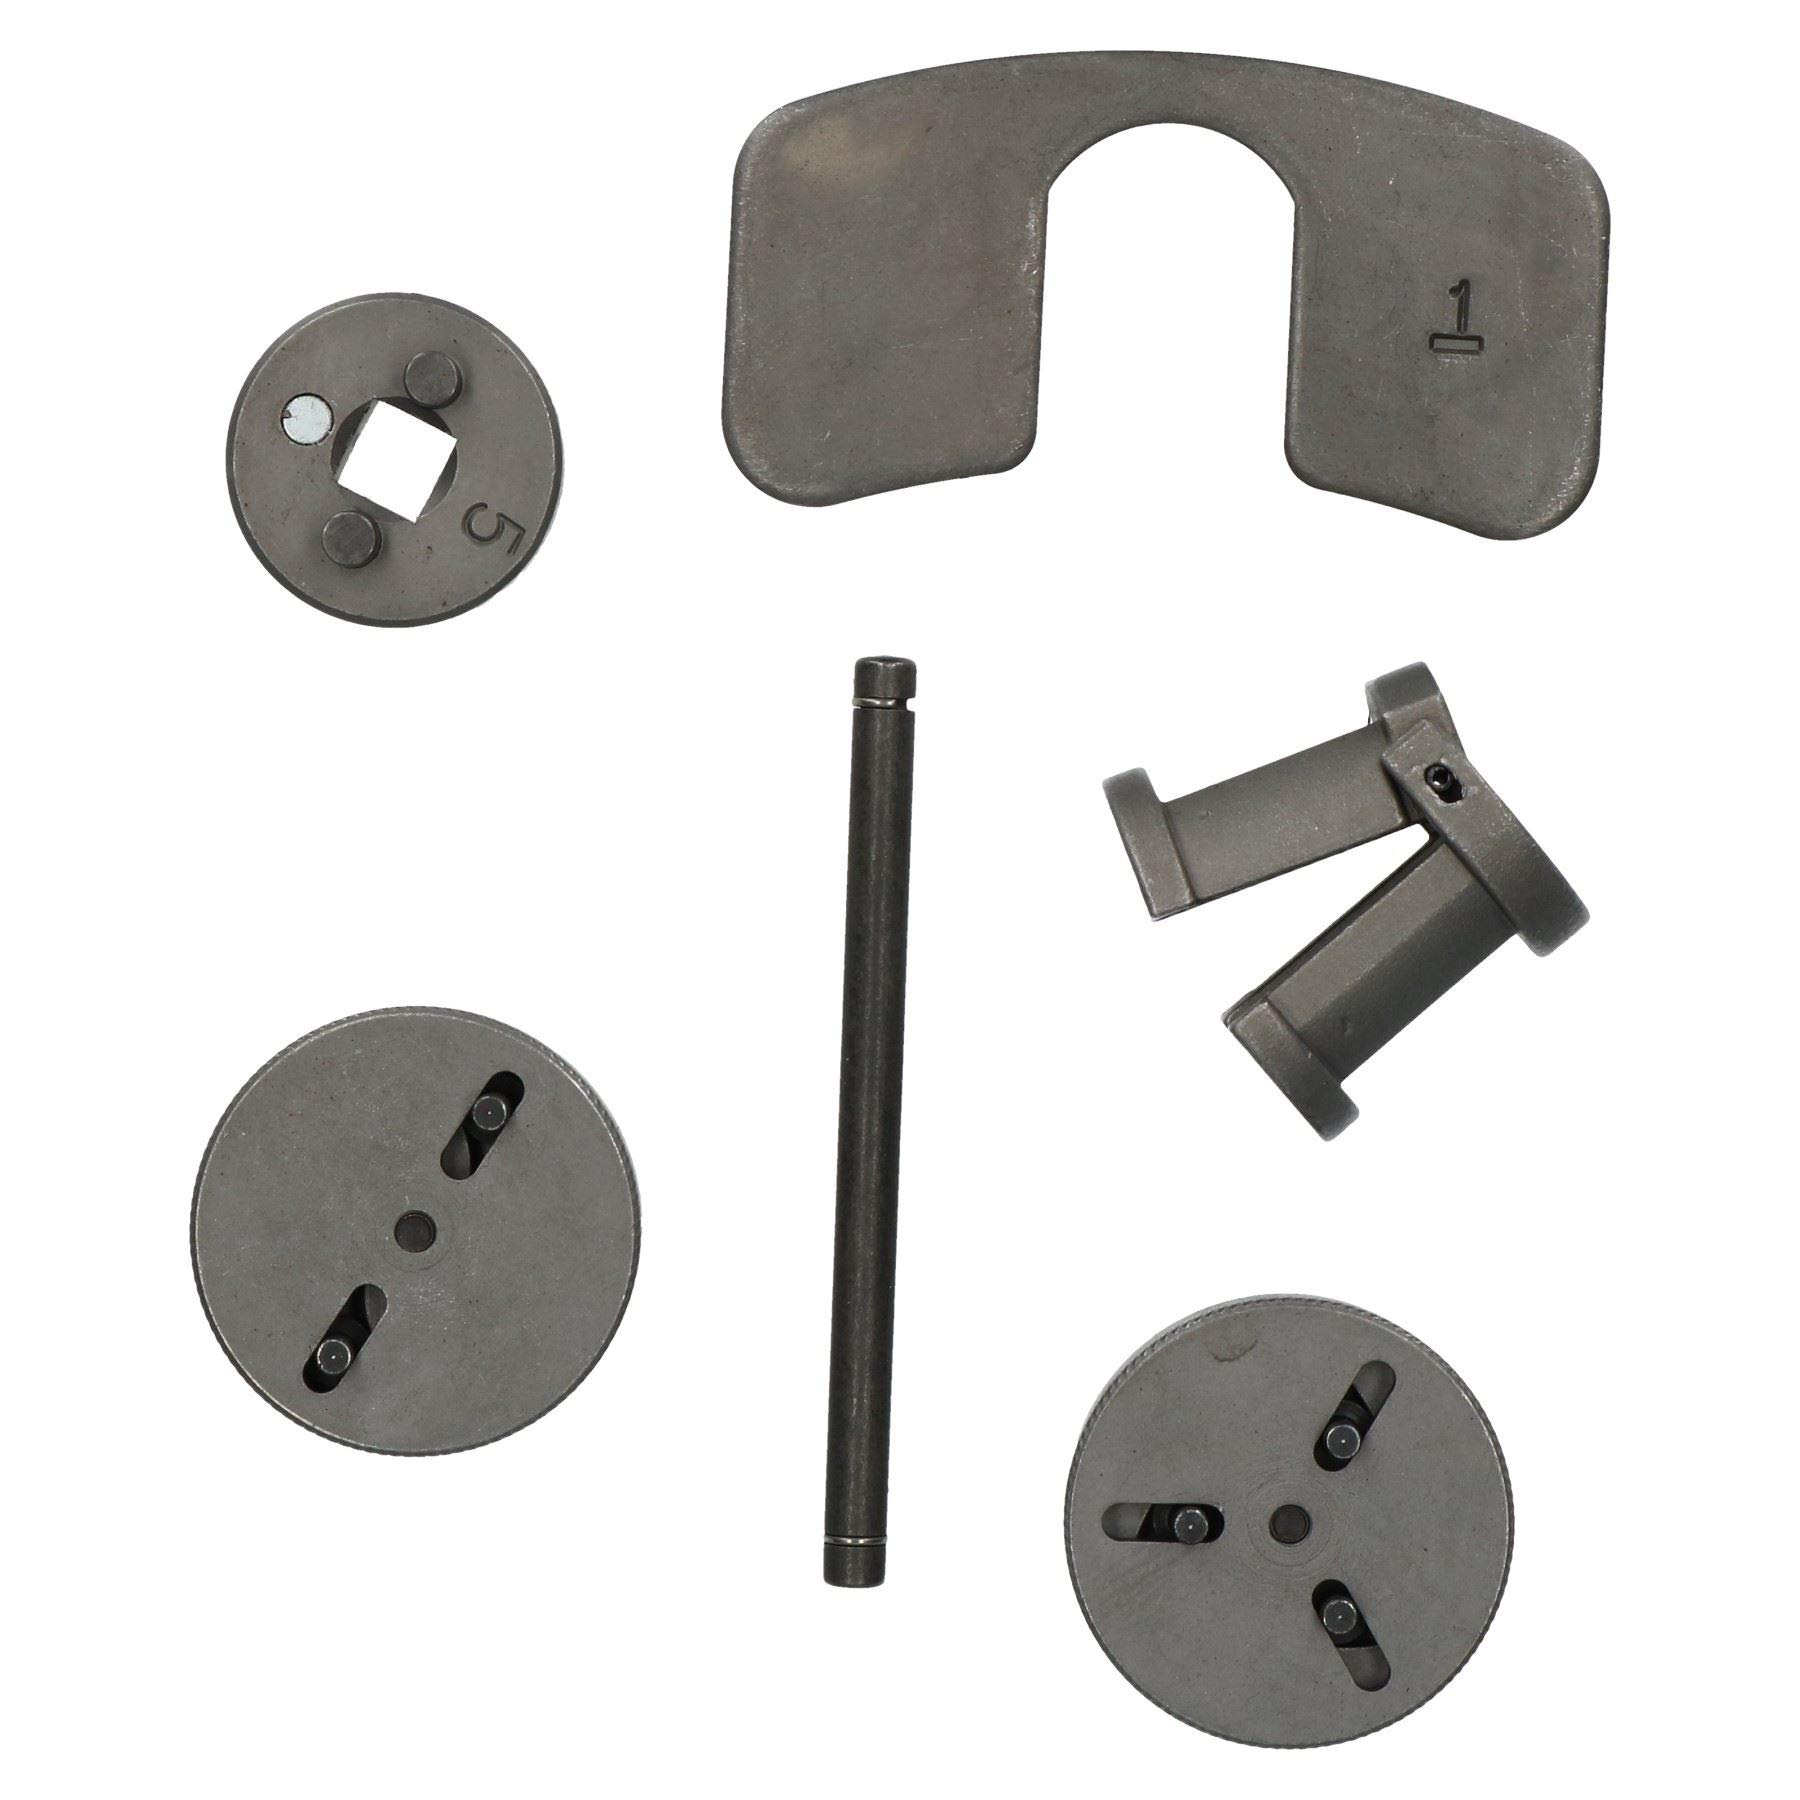 AB Tools-Neilsen 7pc Universal Adjustable Brake Caliper Rewind Tool Kit 2 and 3 Pin Wind Back Kit by AB Tools-Neilsen (Image #2)